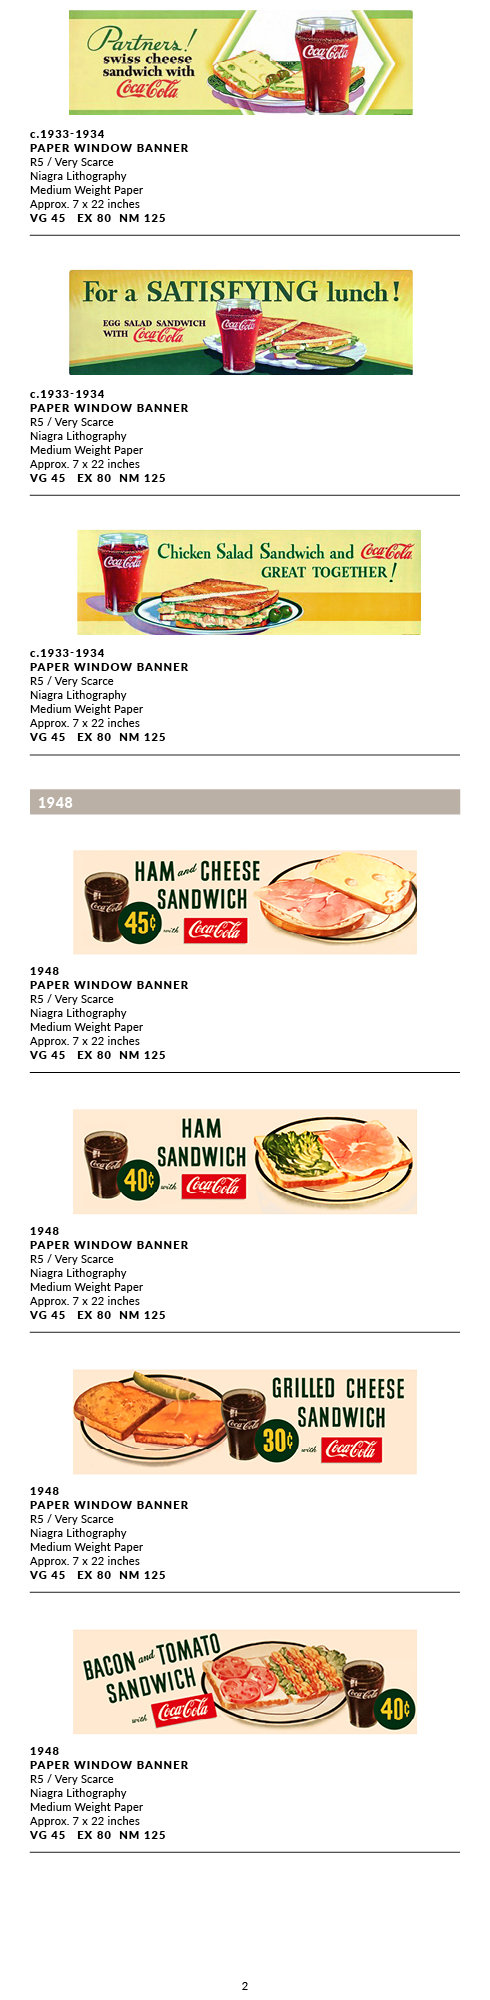 Food Channel Card2.jpg